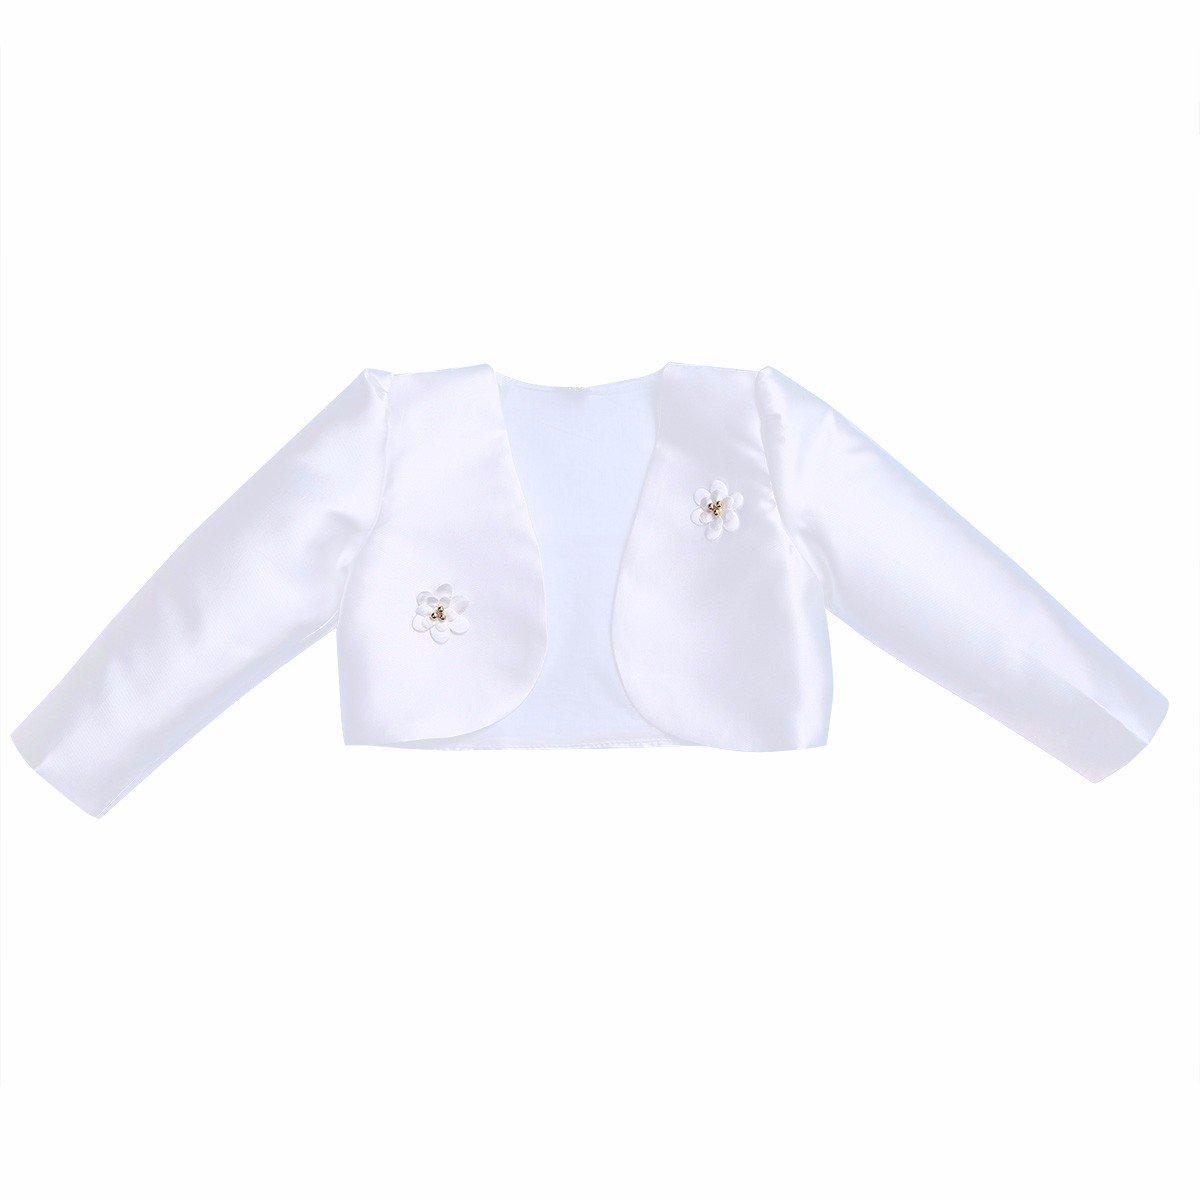 iEFiEL Kids Girls Beaded Bolero Wedding Flower Dress Jacket Shrug Short Cardigan White 10.12